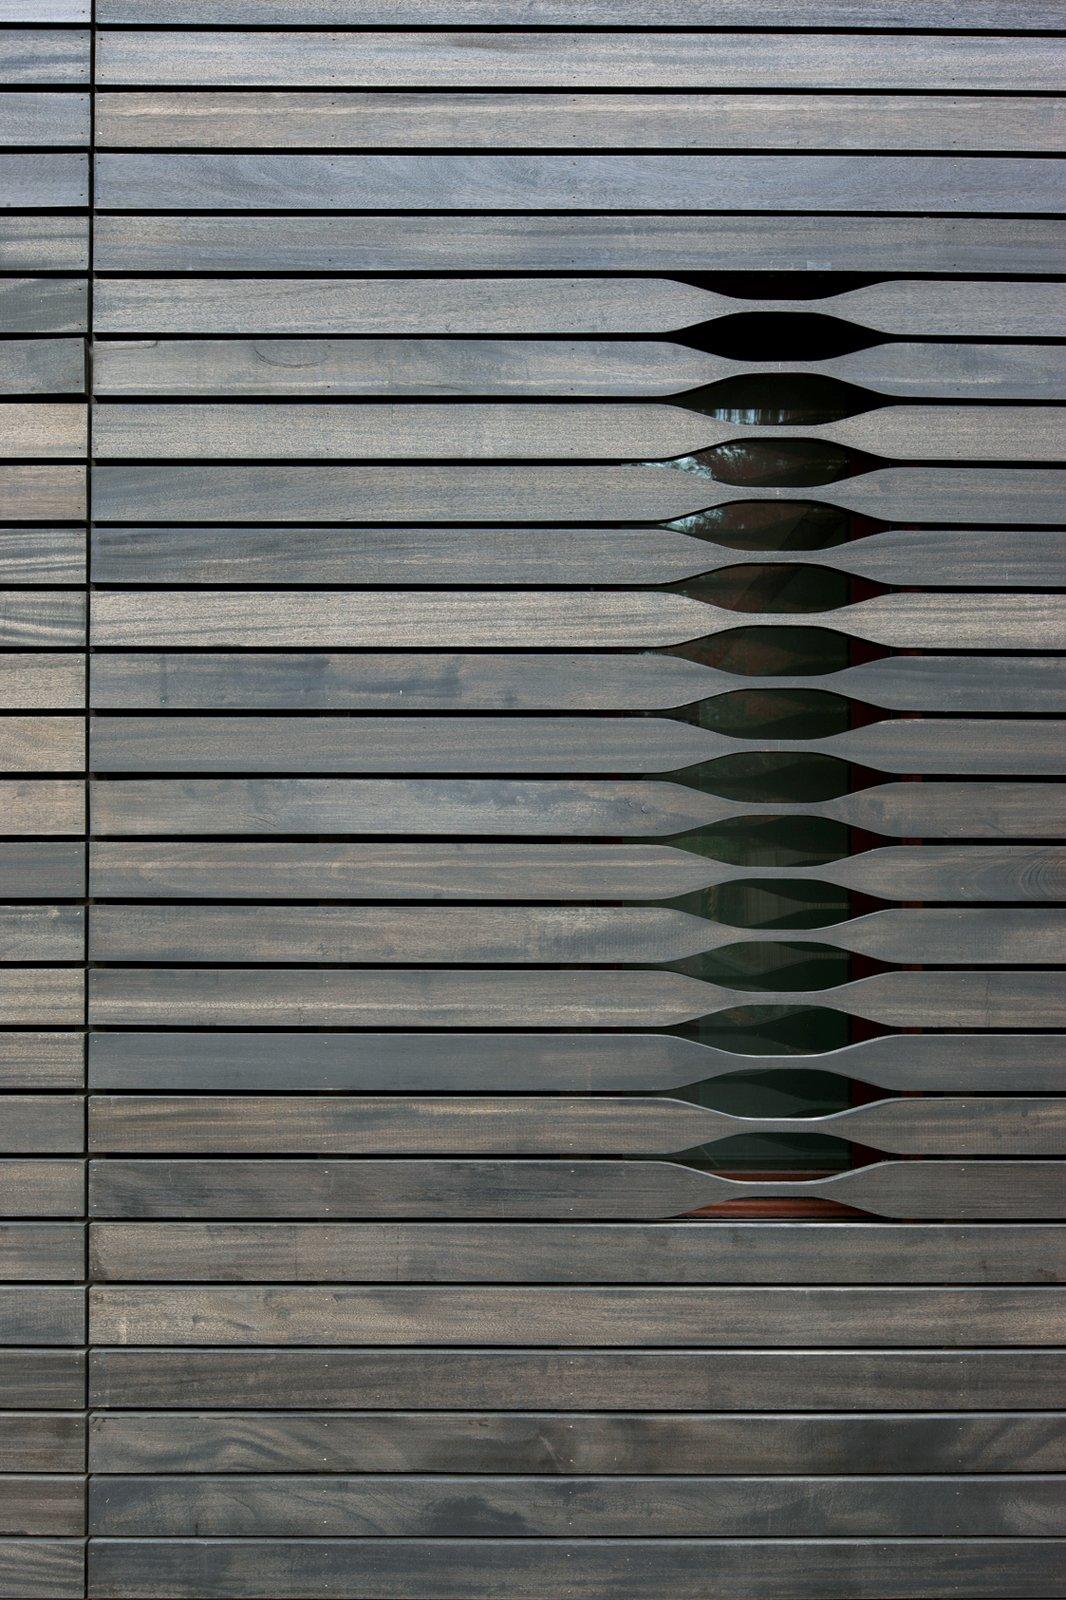 Photo 1 of 2 in Facade Focus: Wood